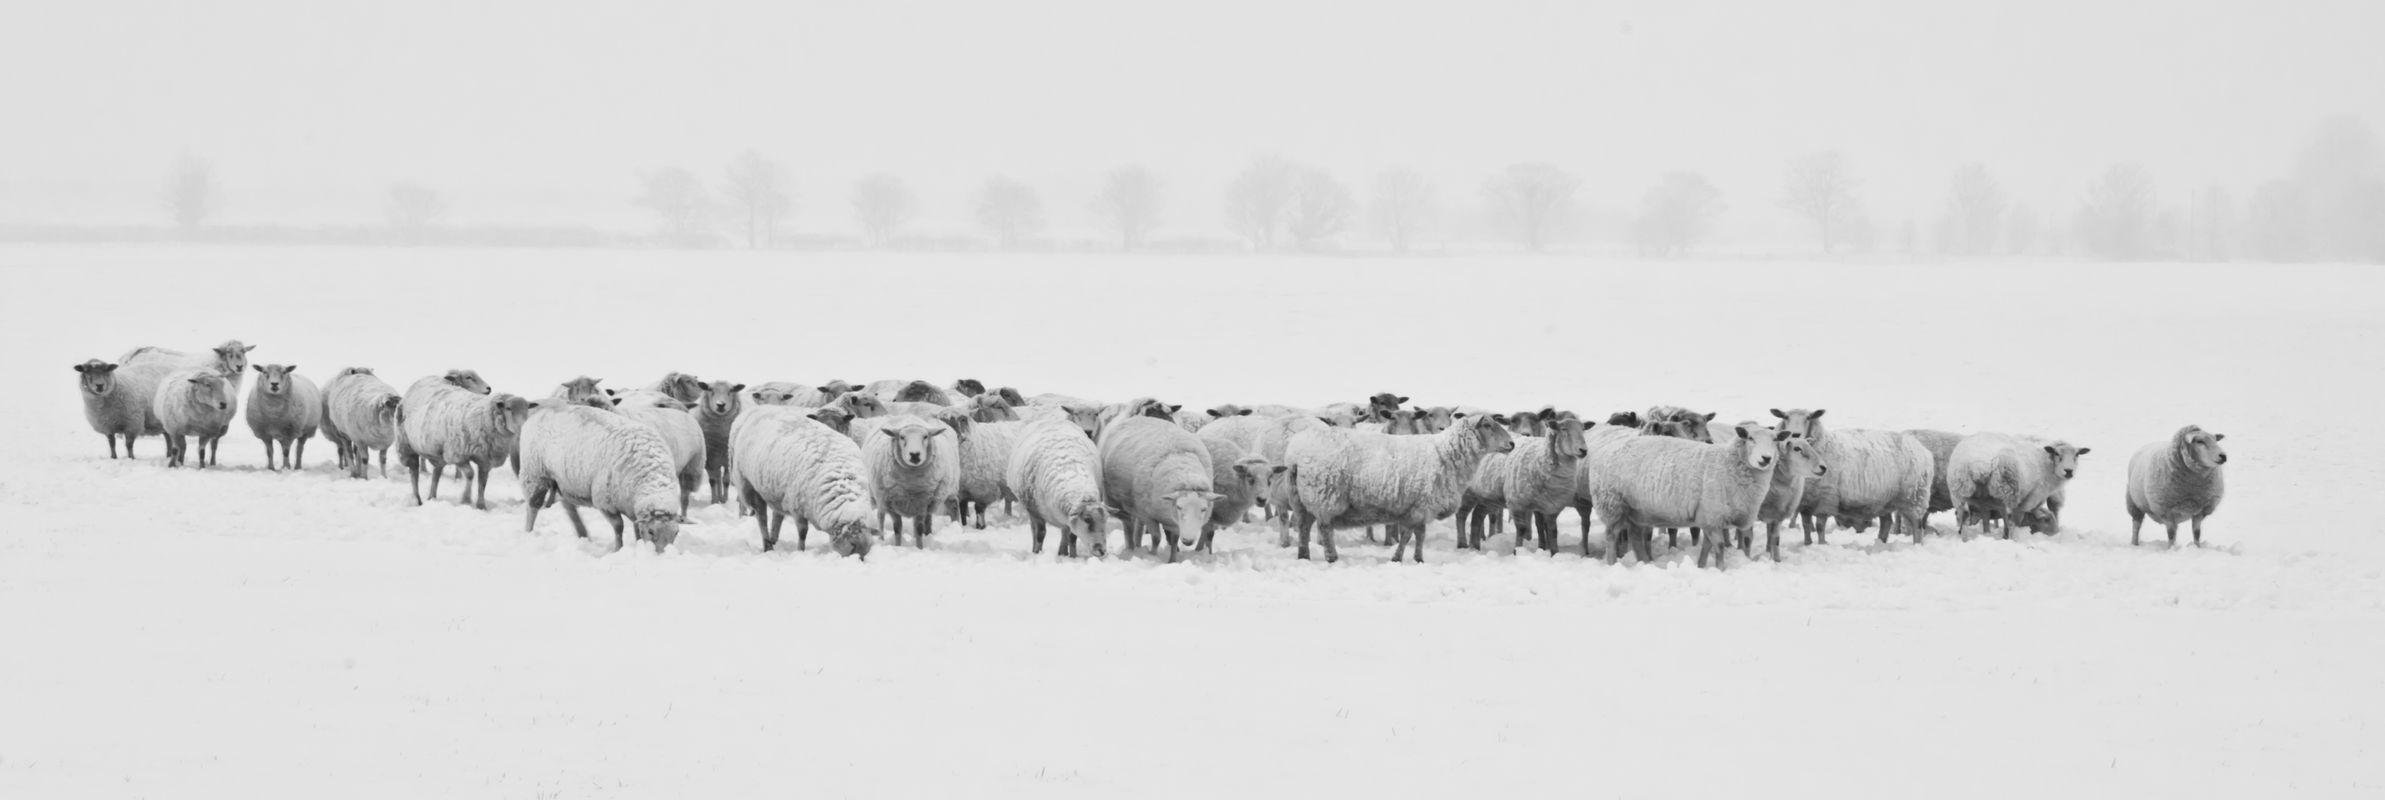 Winter-black-and-white